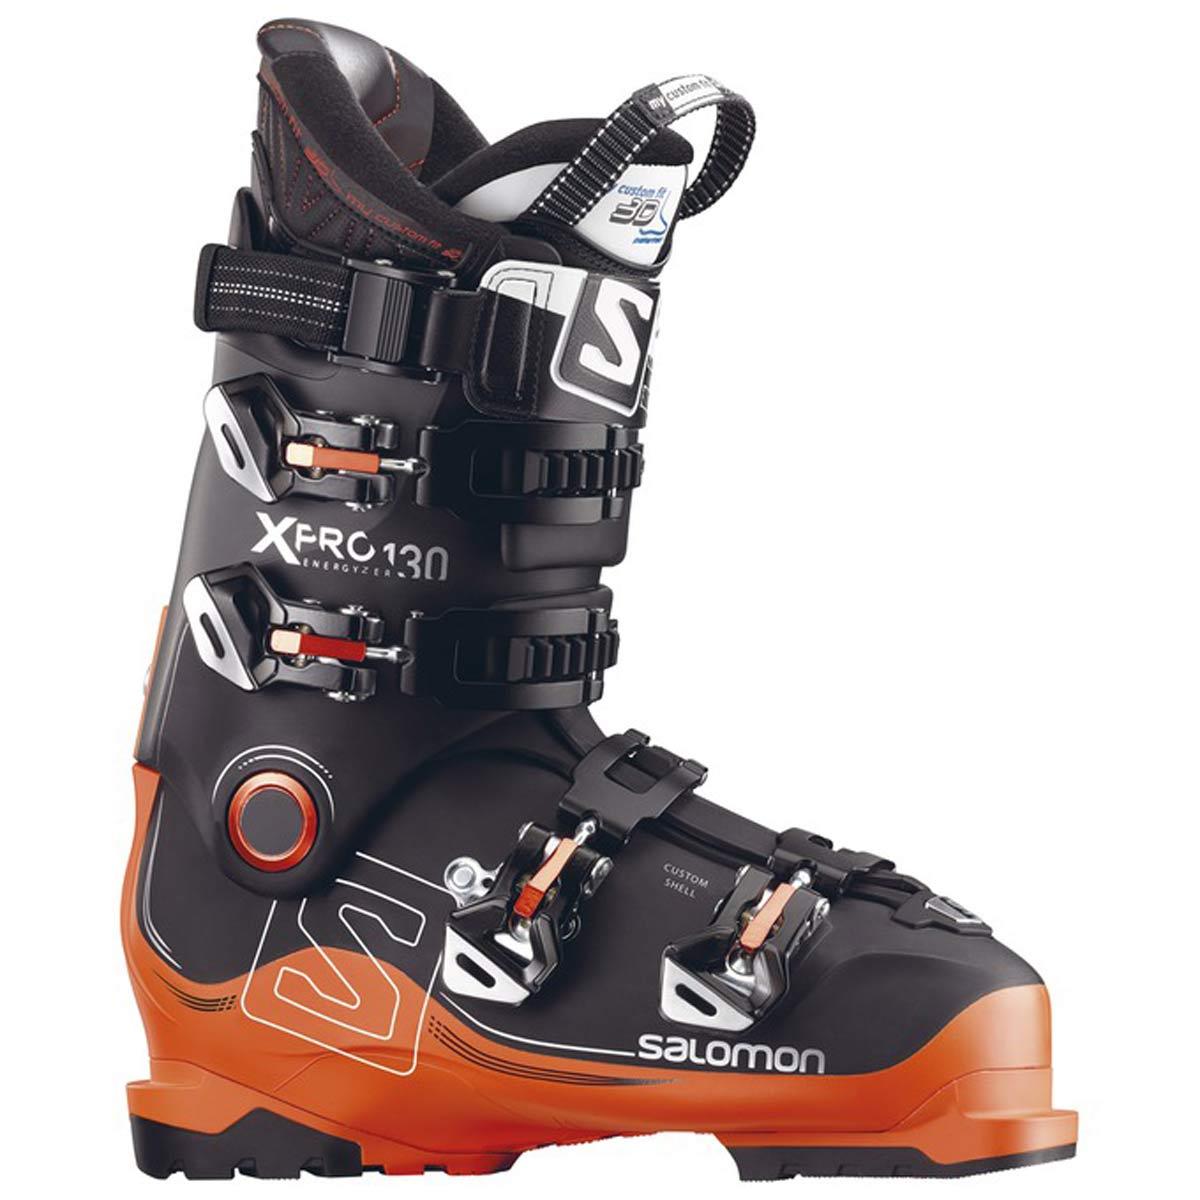 Salomon Men's X Pro 130 Ski Boots On Sale